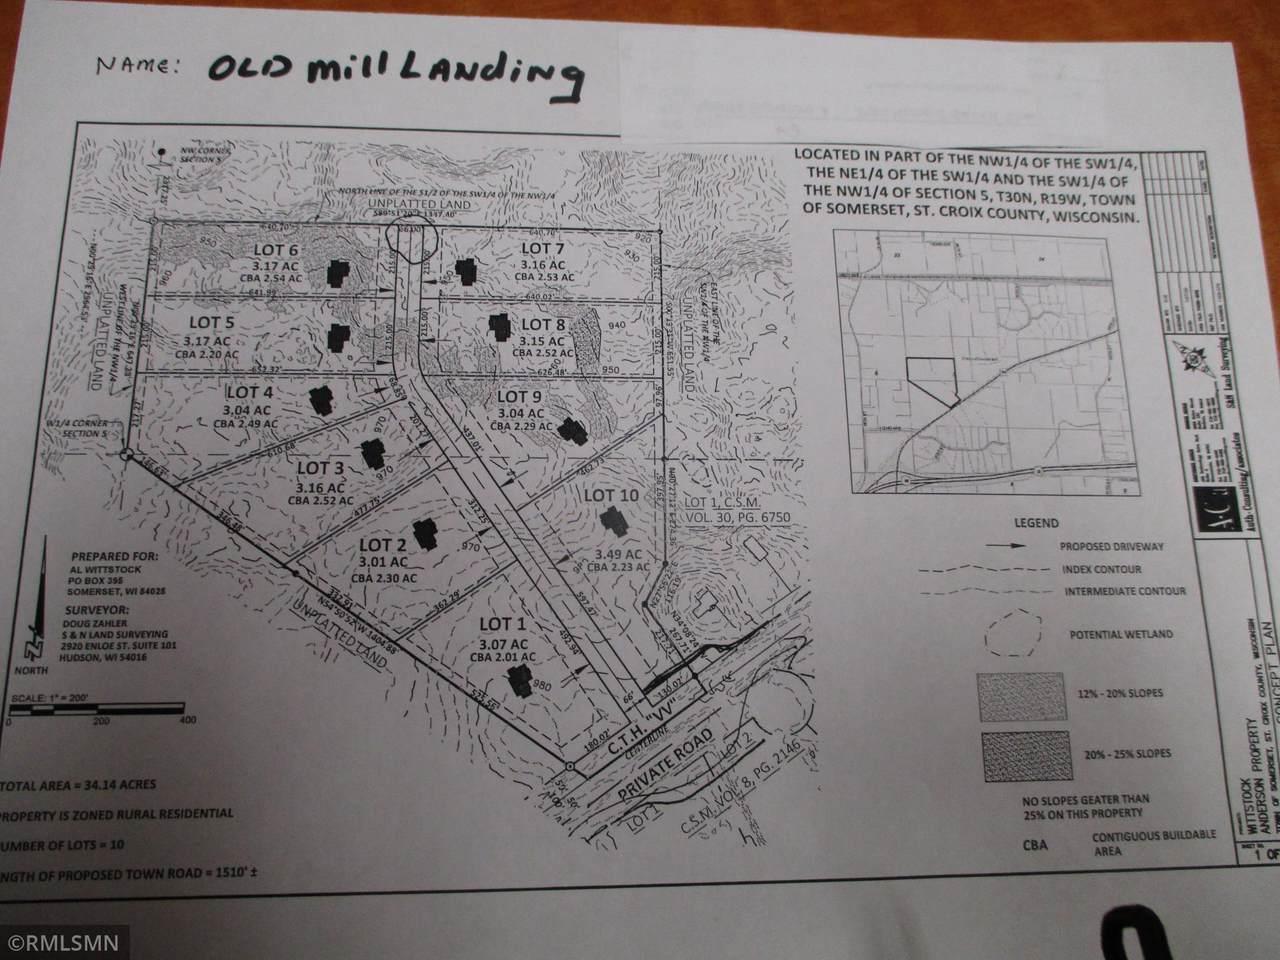 xxx lot 10 County Rd V V Old Mill Landing - Photo 1